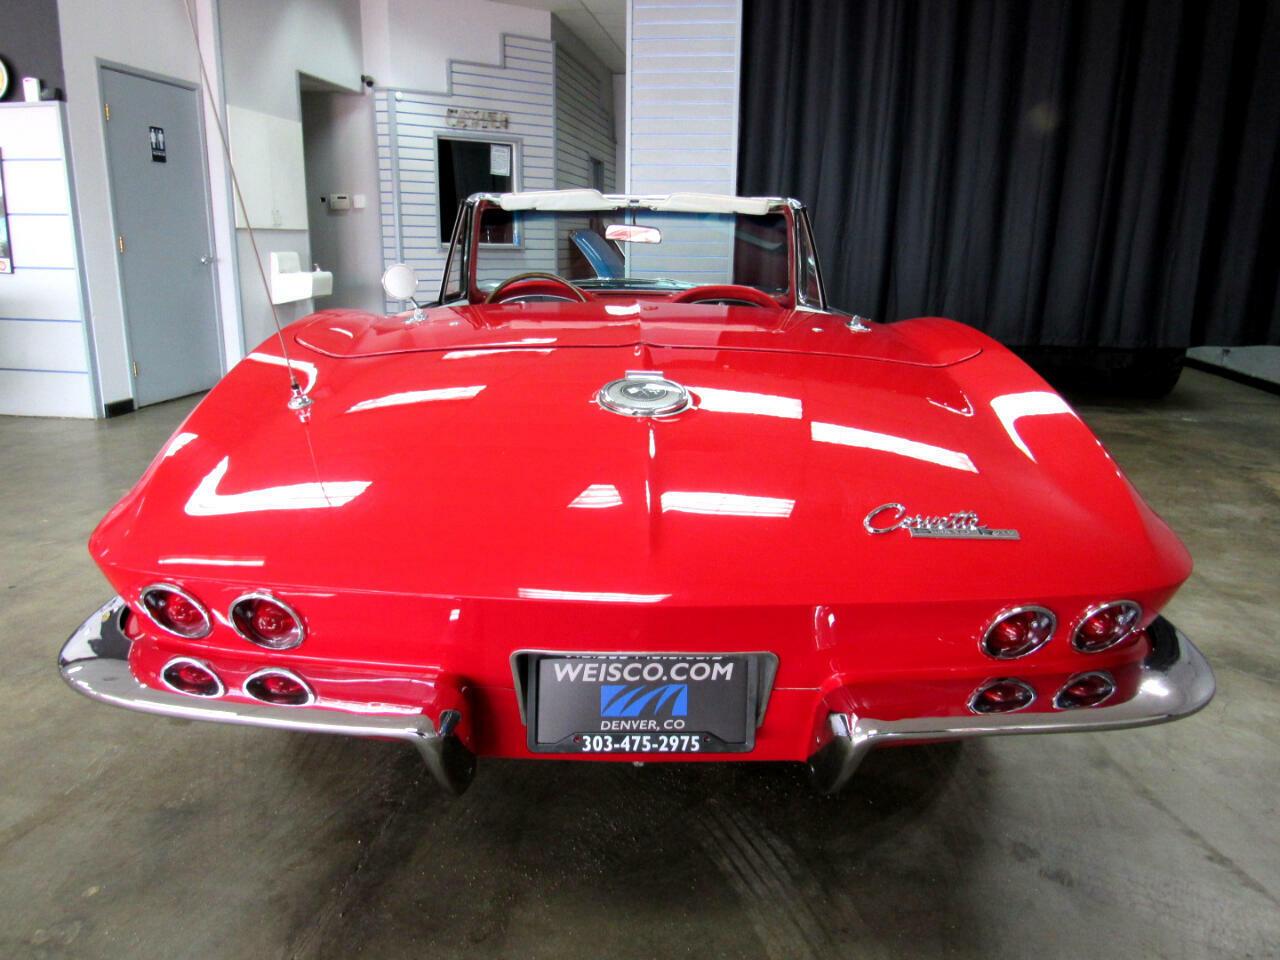 1964 Red Chevrolet Corvette Convertible  | C2 Corvette Photo 6